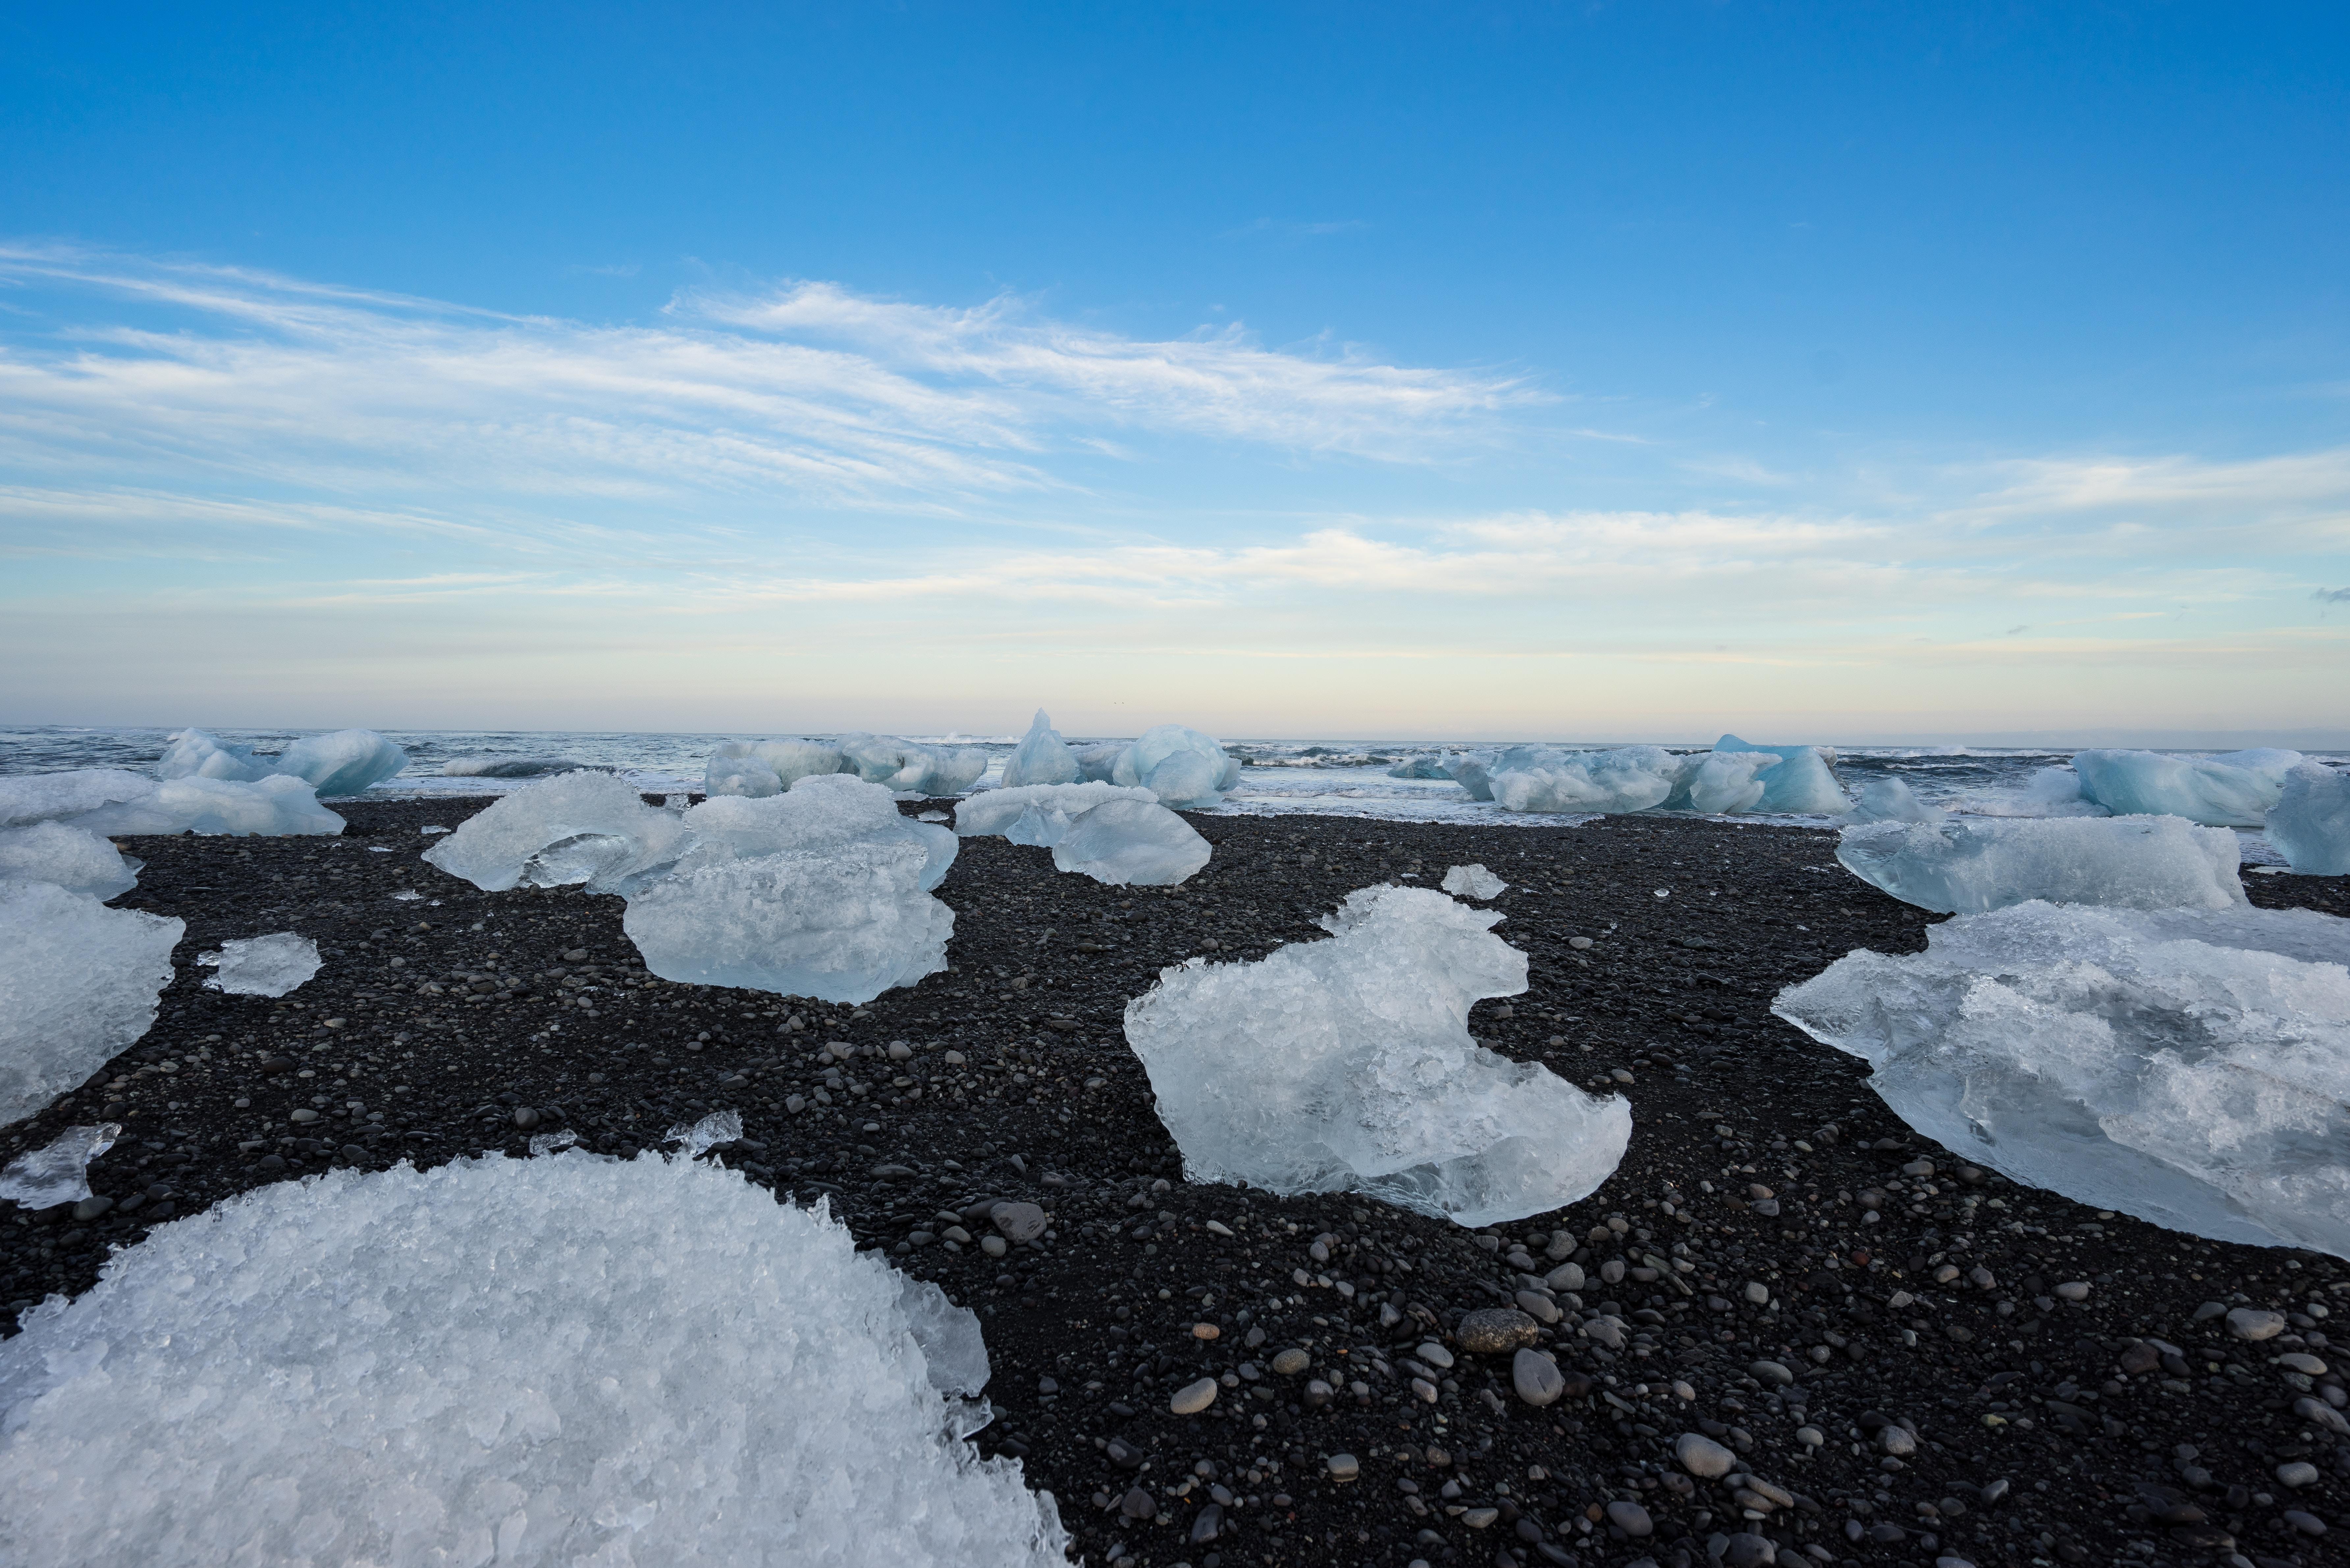 Melting glaciers of ice on a dark, rocky beach